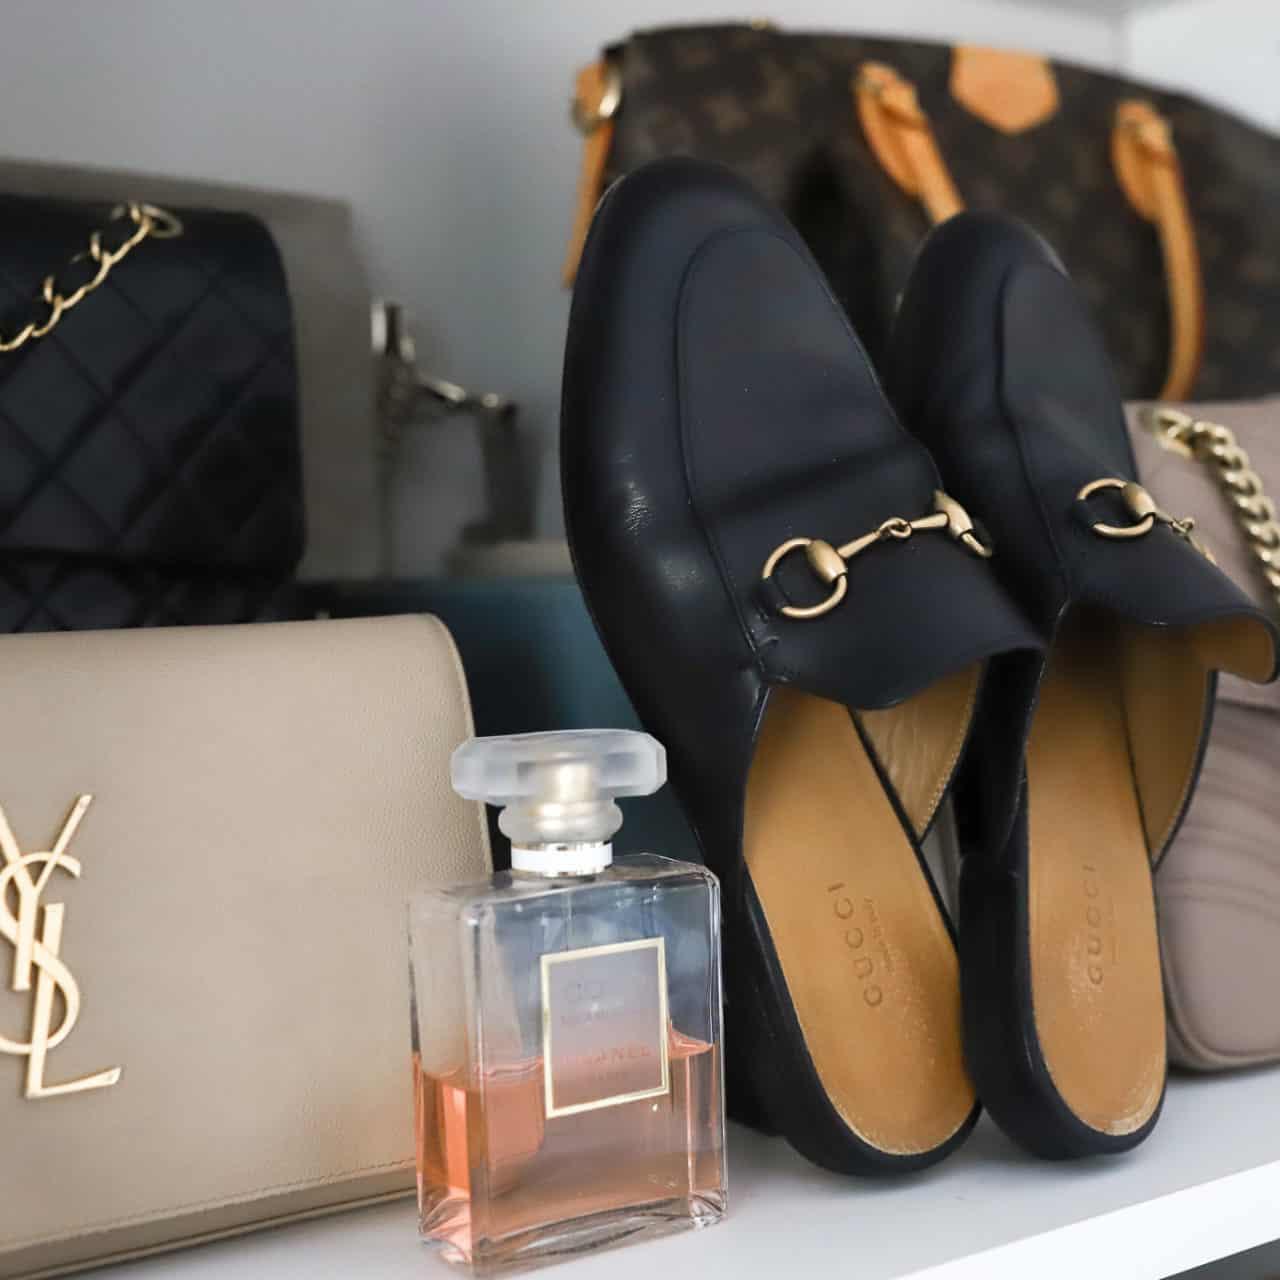 My Designer Handbag Collection & The Story Behind Each Bag